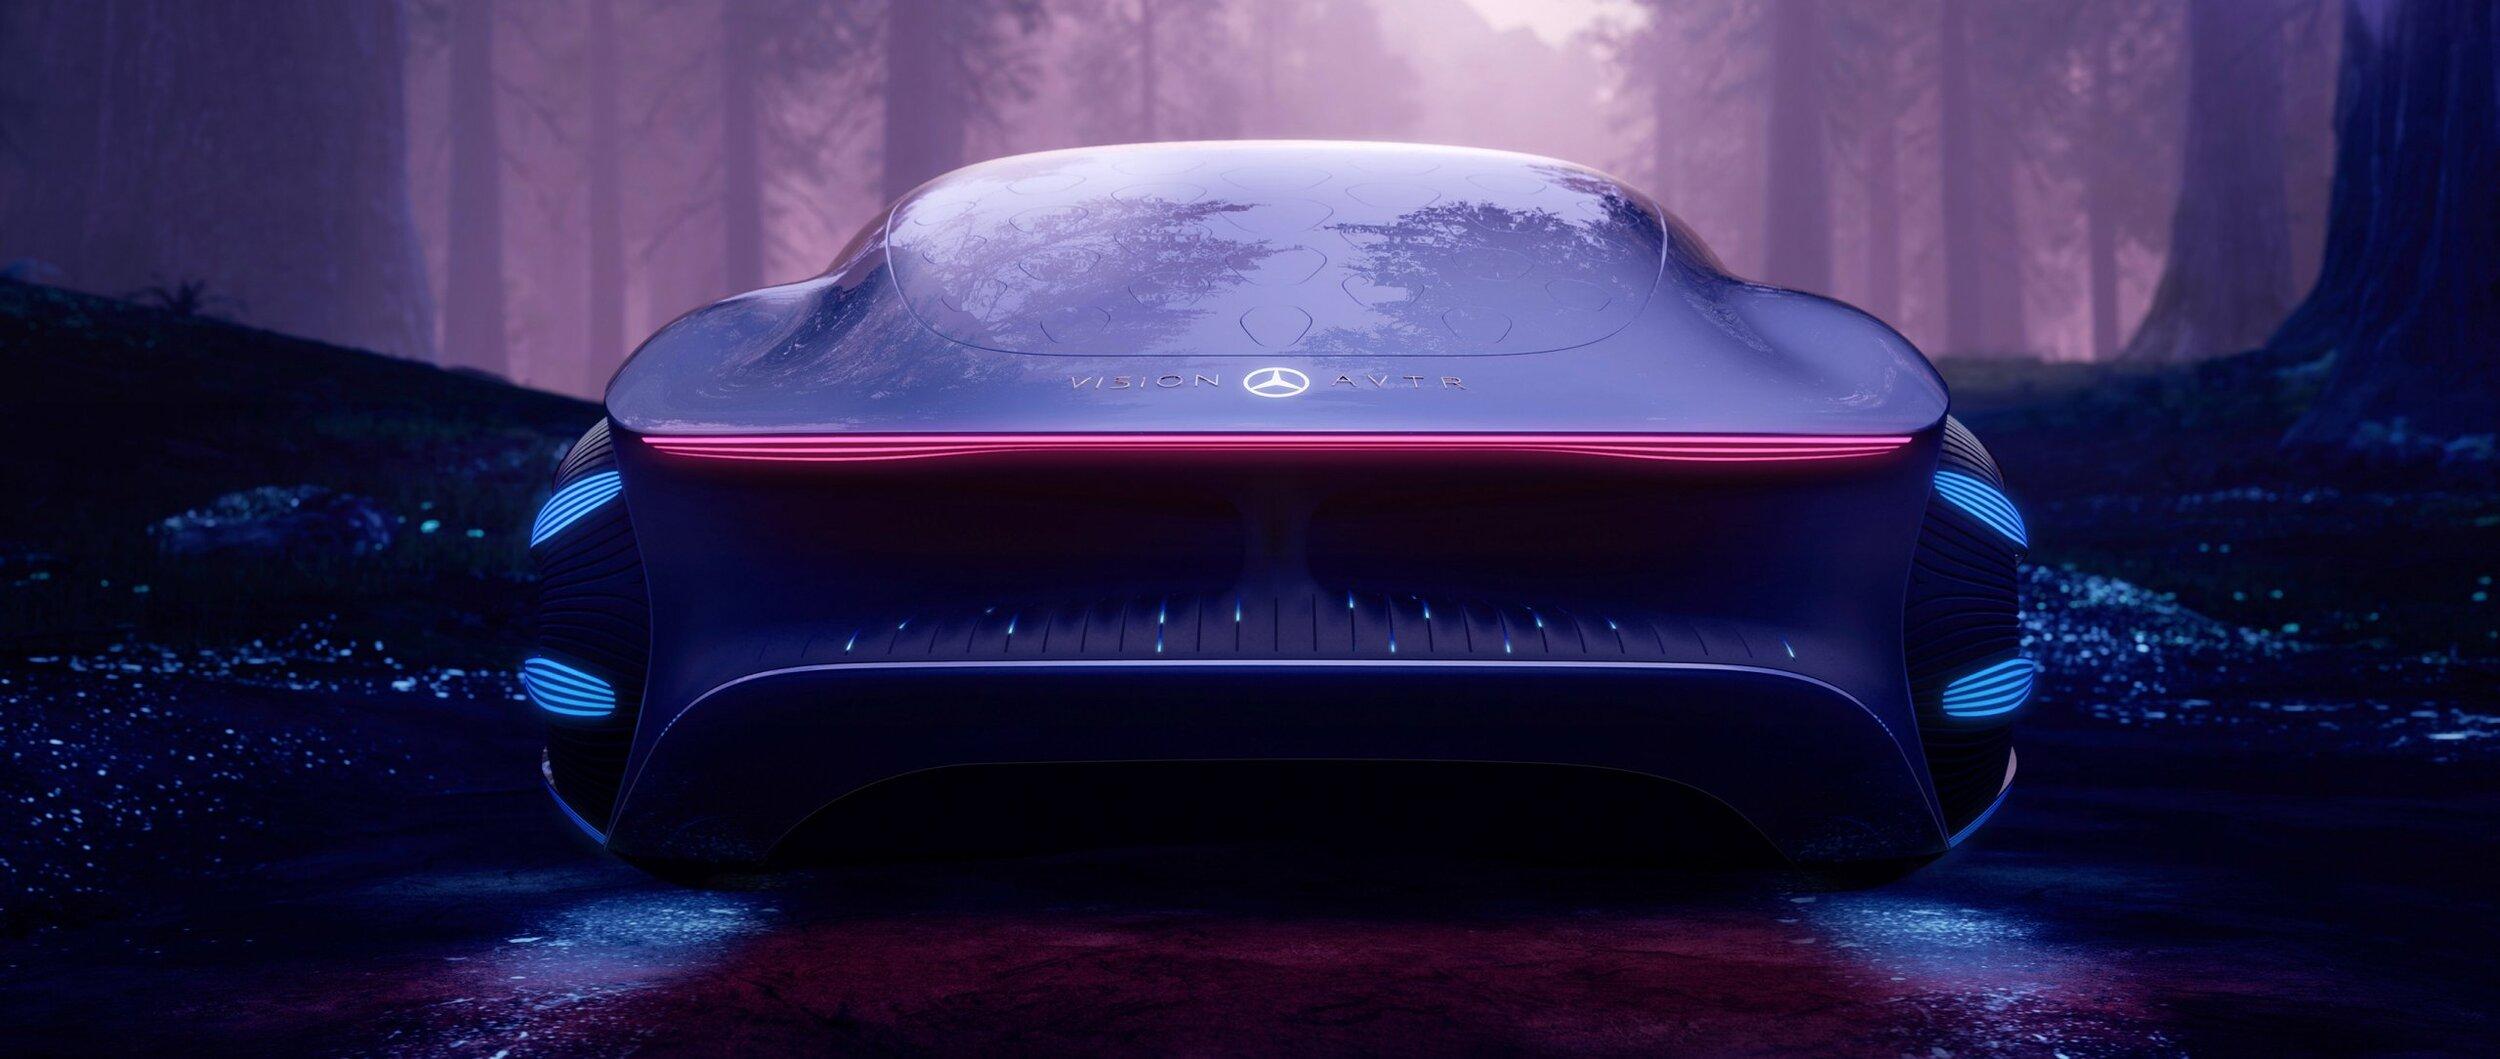 14-mercedes-benz-vehicles-concept-cars-vision-avtr-3400x1440.jpeg